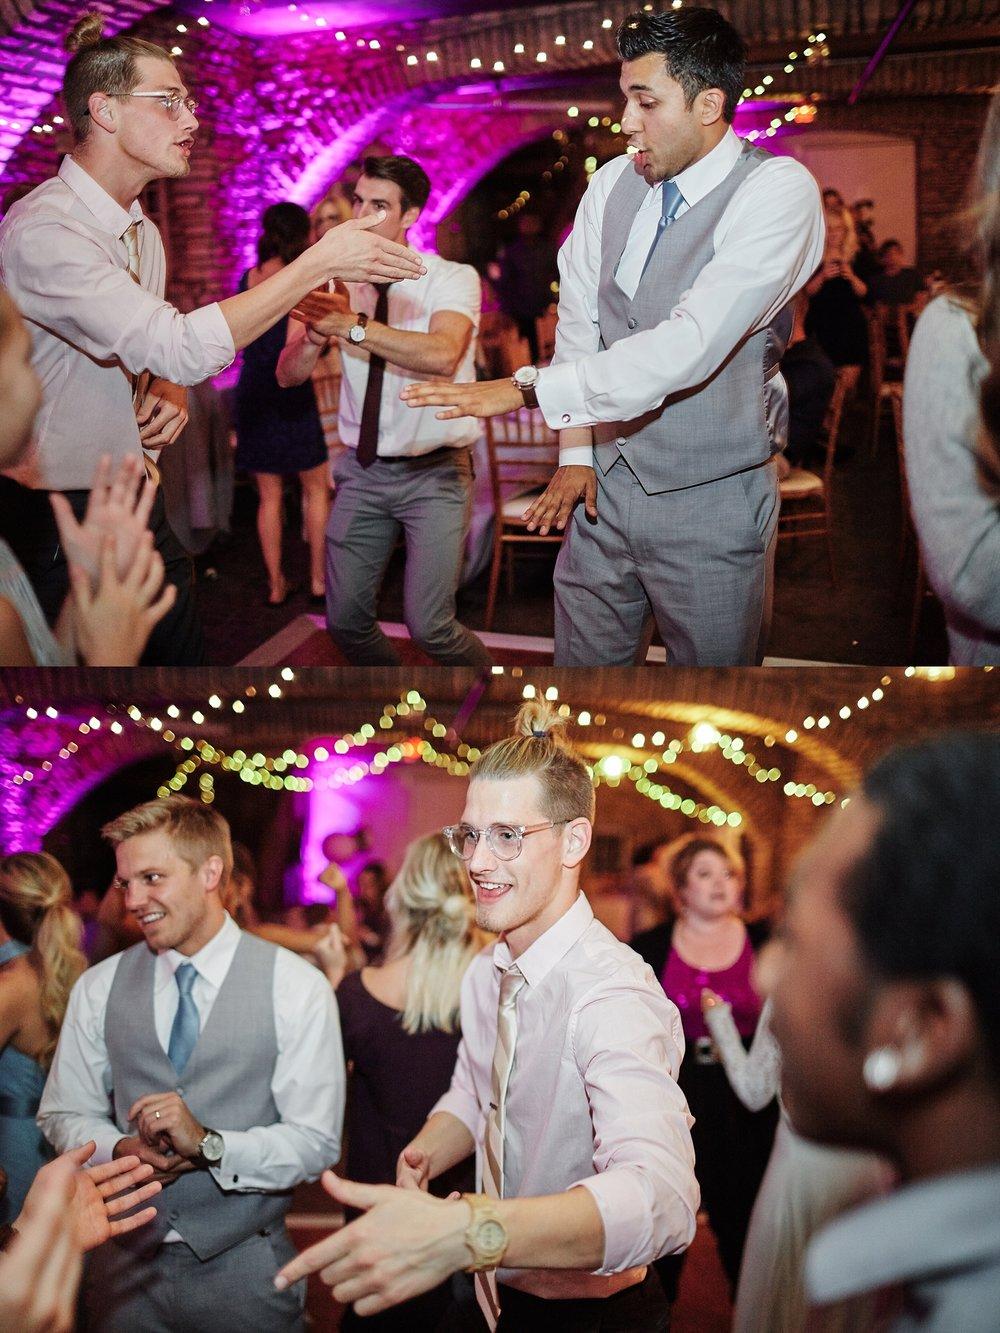 Maywood-Stone-Barn-Wedding-Rochester-Minnesota-Perry-James-Photo_0700.jpg